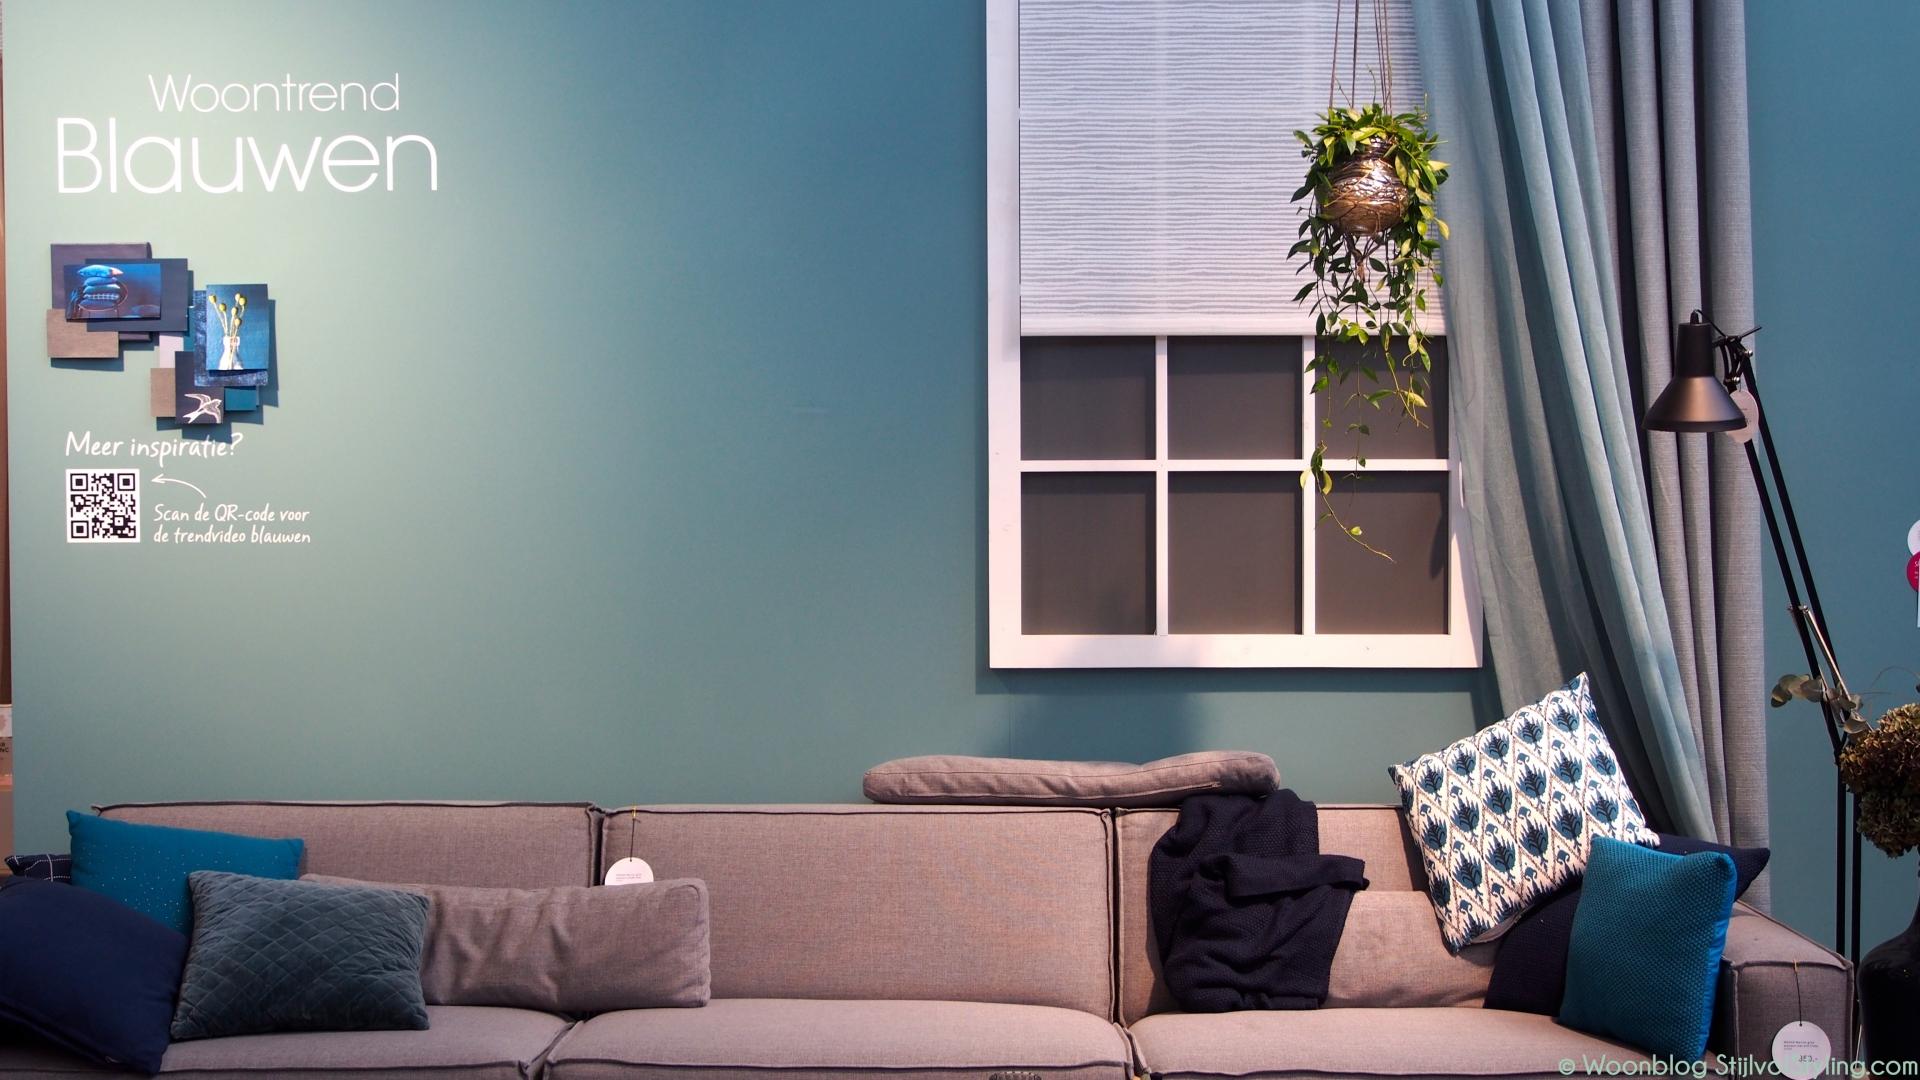 Interieur | Blue monday? Interieur & kleur inspiratie met blauw ...